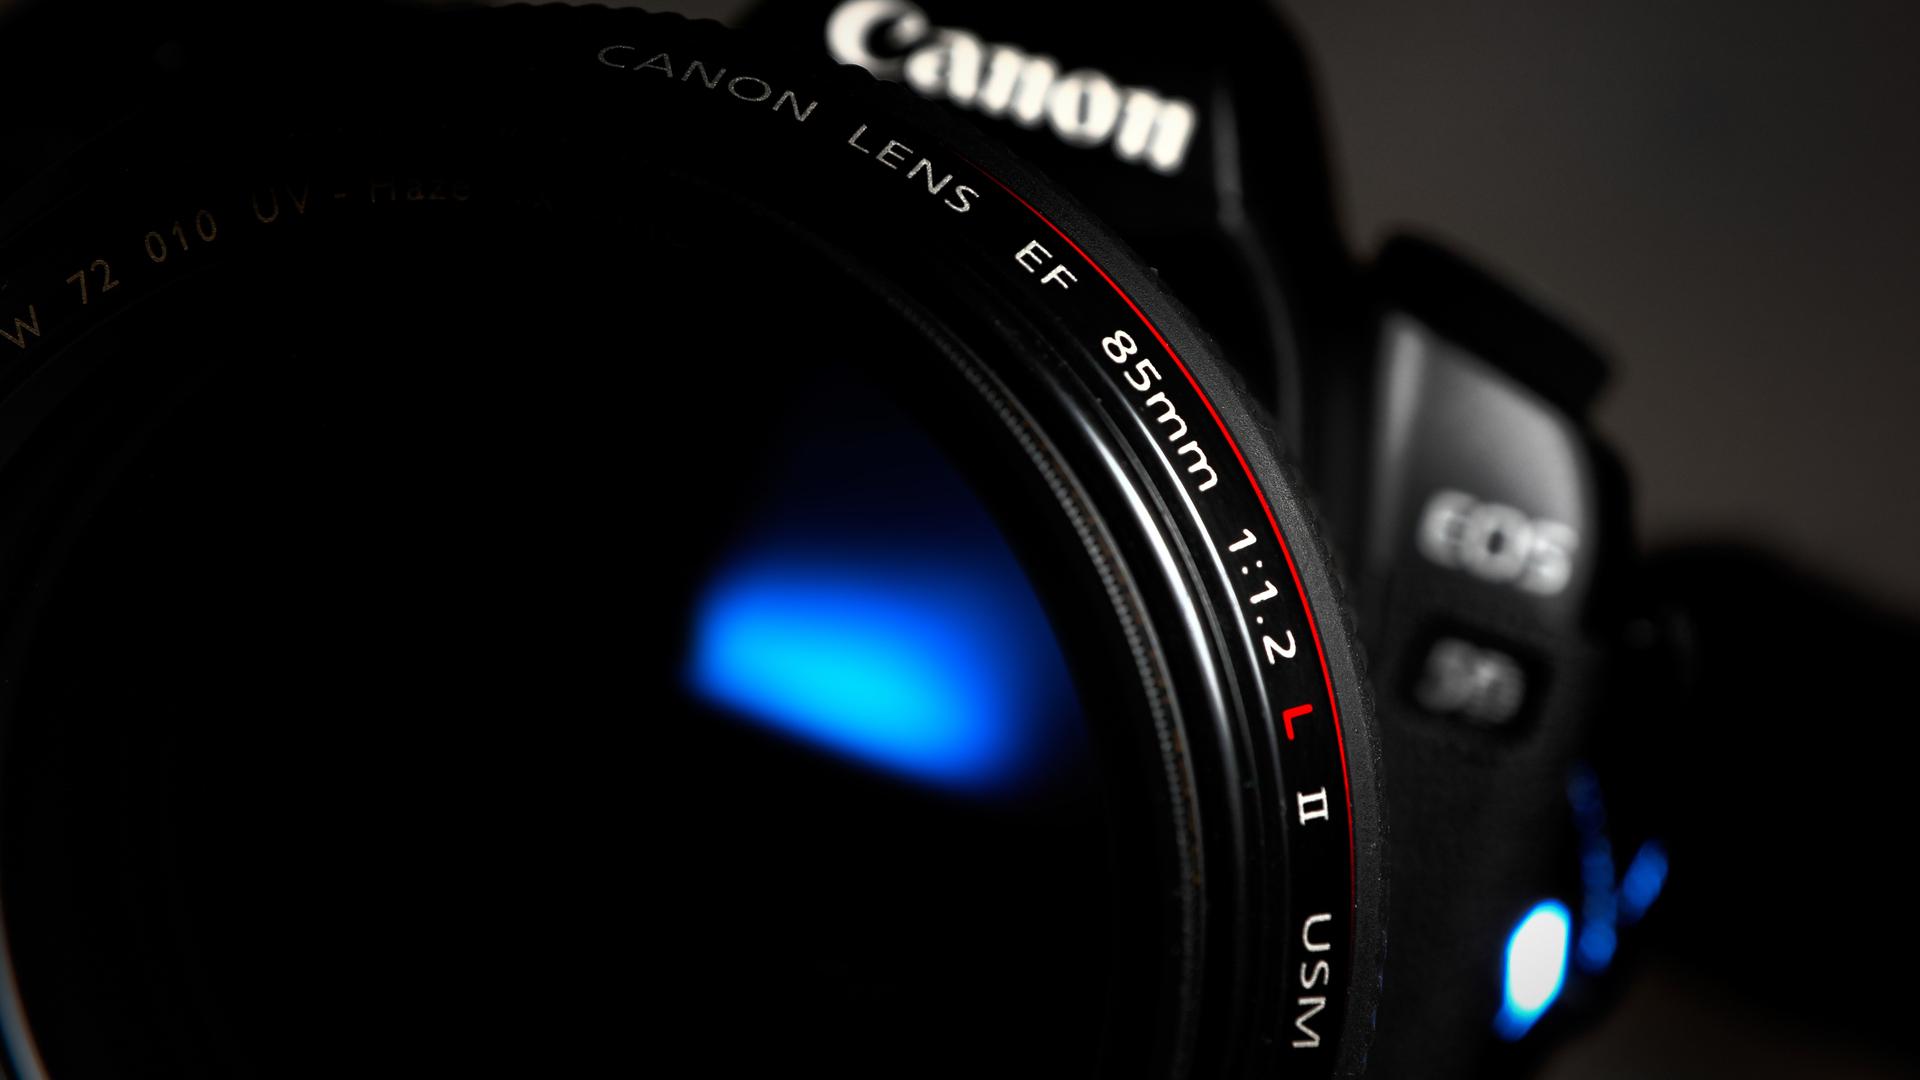 Wallpaper Canon Camera Photography Wallpaper HD Wallpapers High 1920x1080